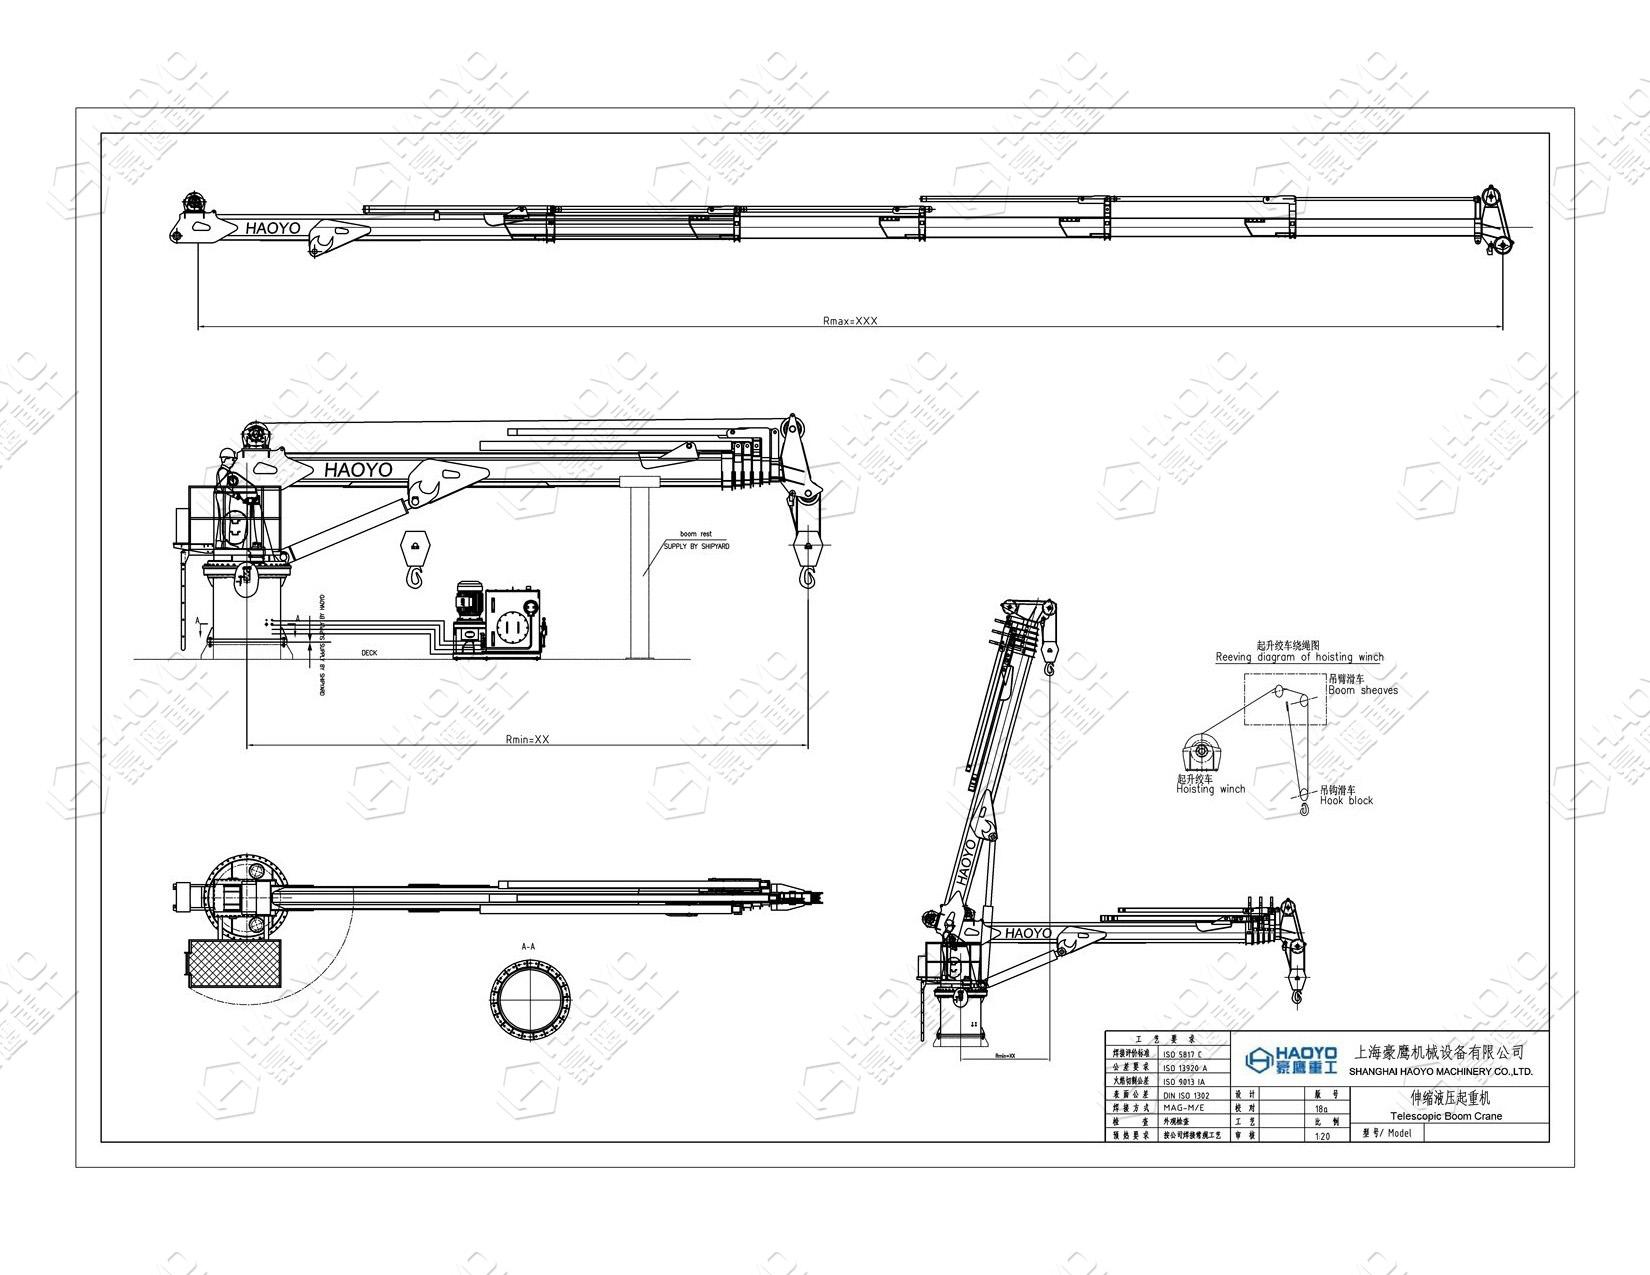 Hydraulic Biggest Mobile Telescopic Crane 4